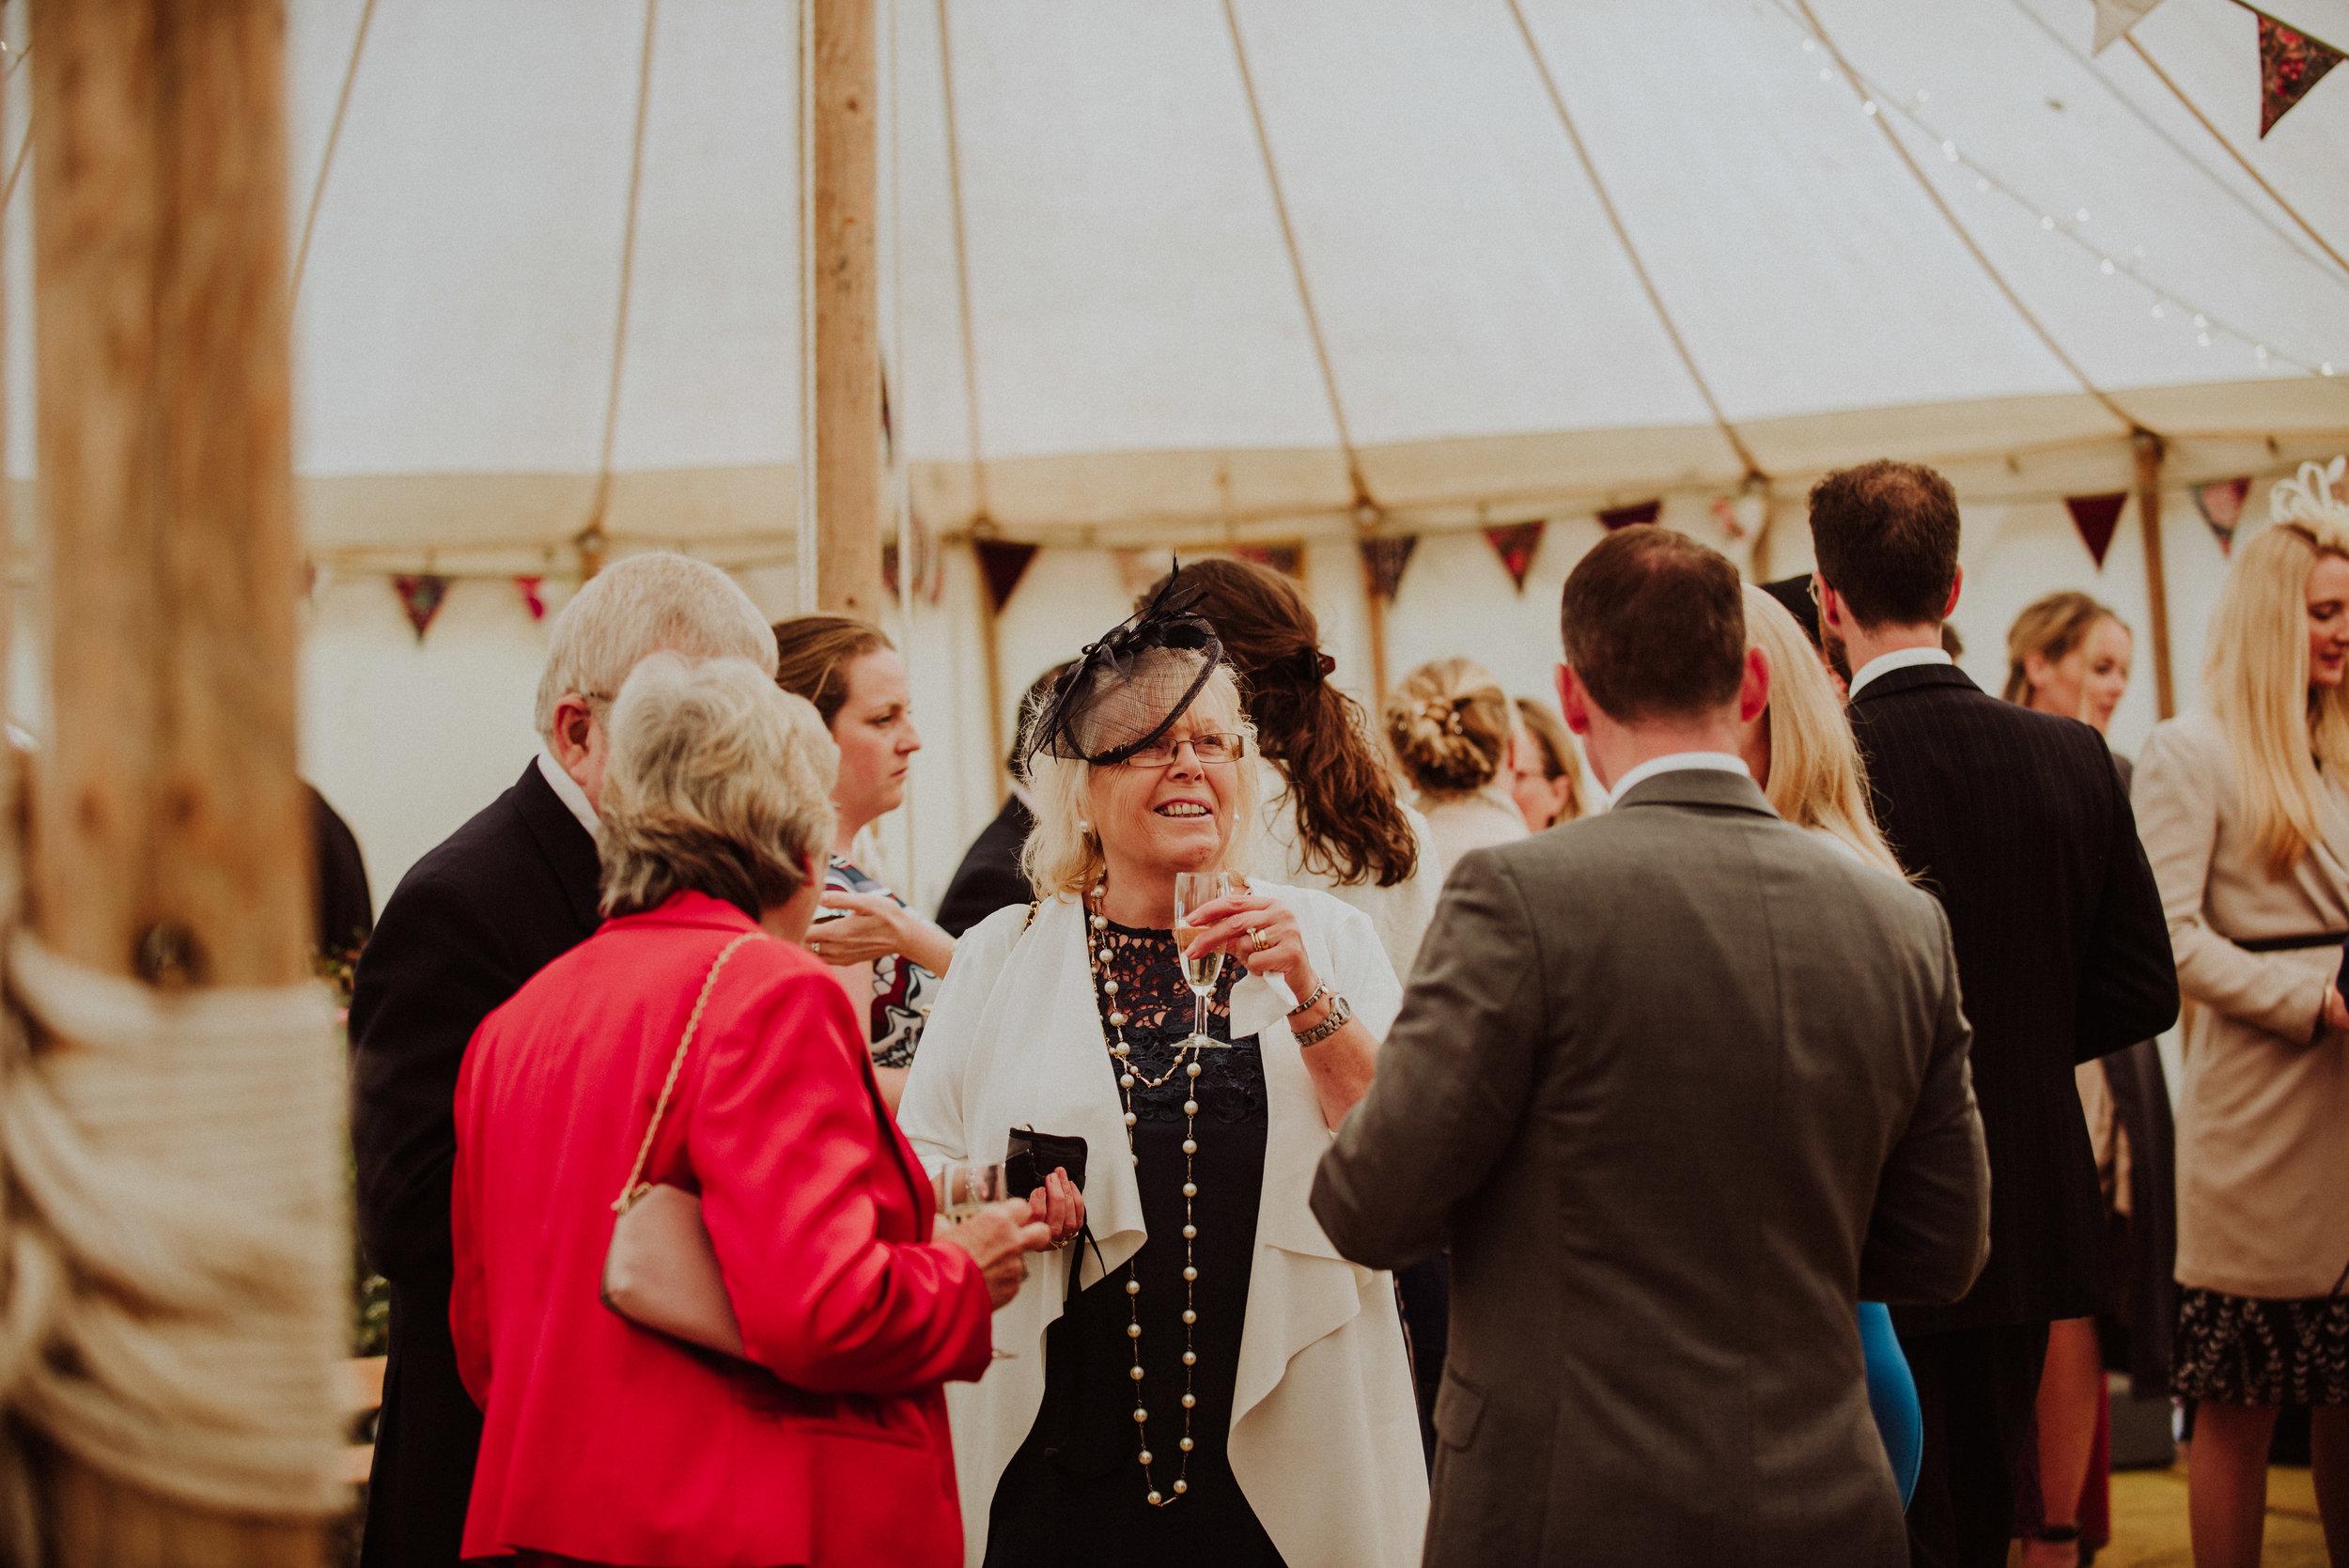 port-eliot-wedding-photographer-44.jpg